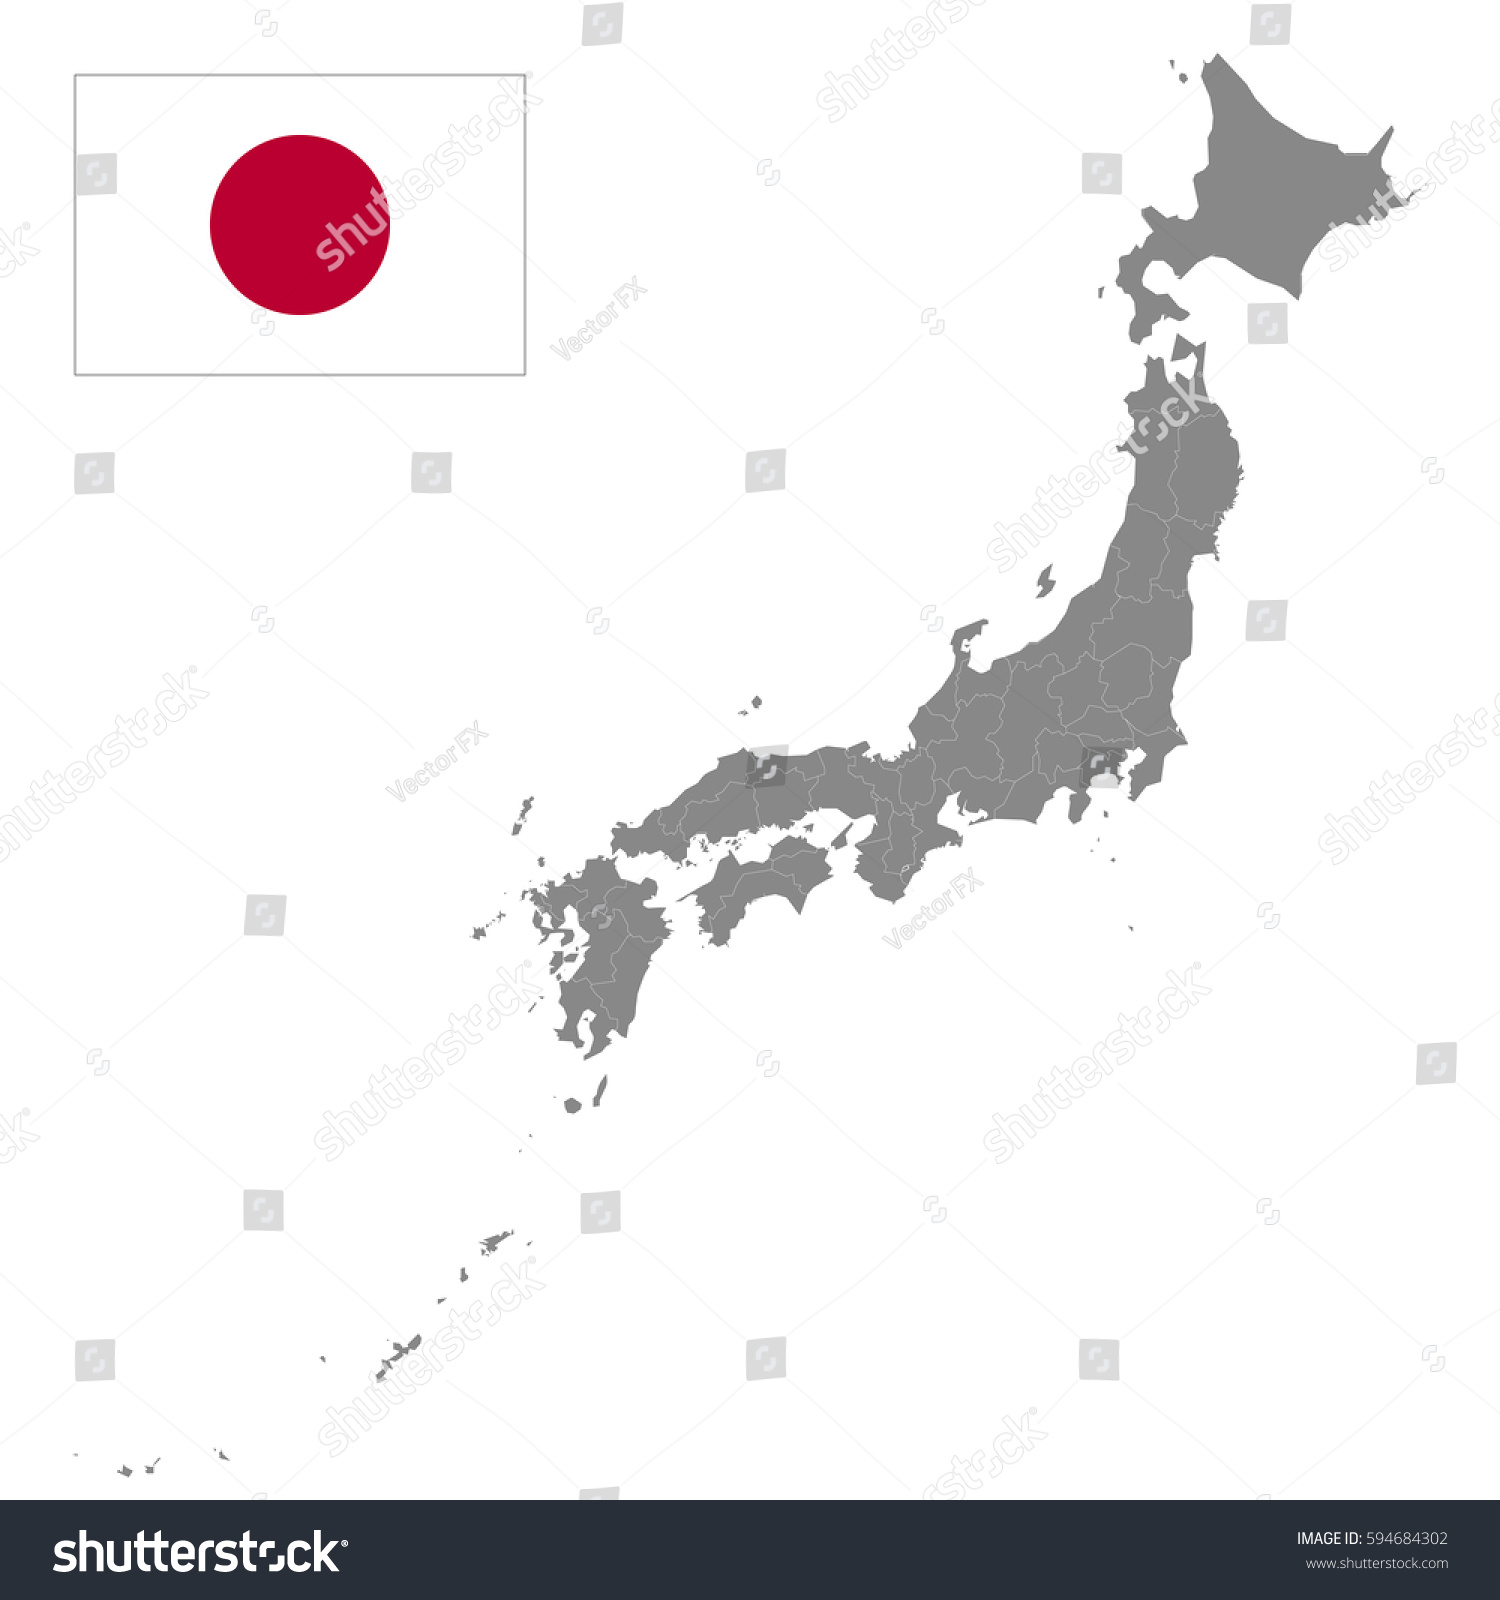 Japan Map Borders Regions Detailed Vector Stock Vector - Japan map regions